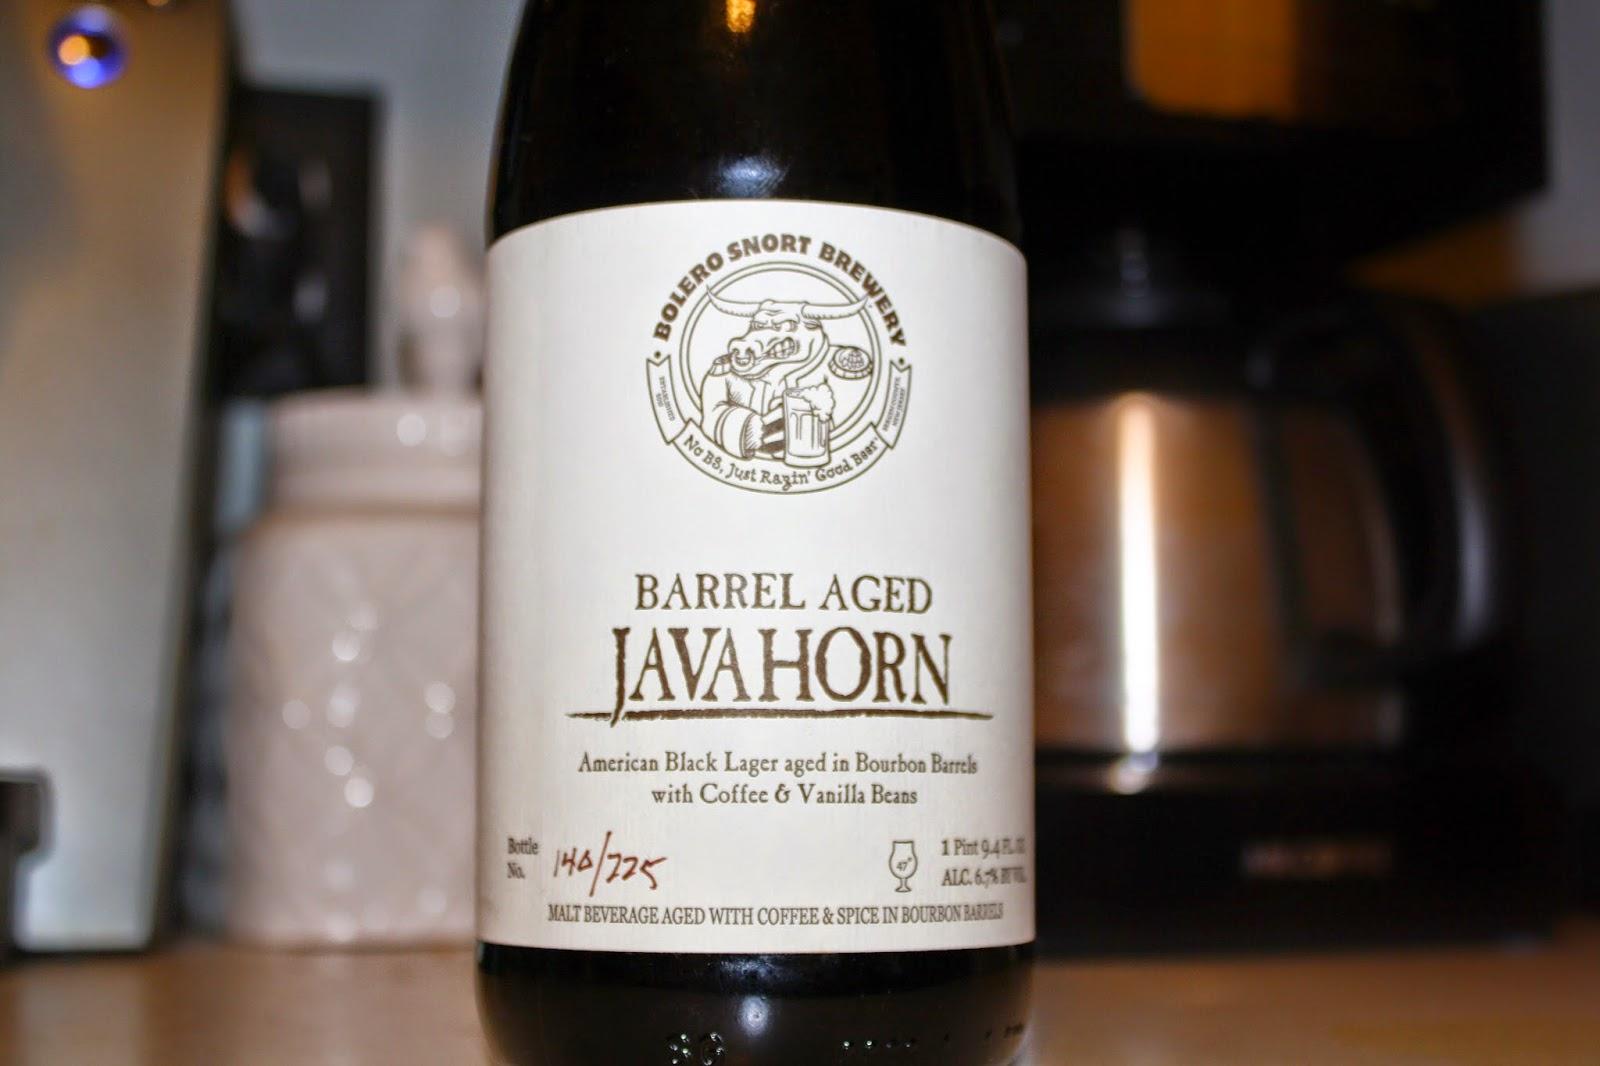 Bolero Snort Brewery, Barrel Aged Javahorn, Beer, New Jersey